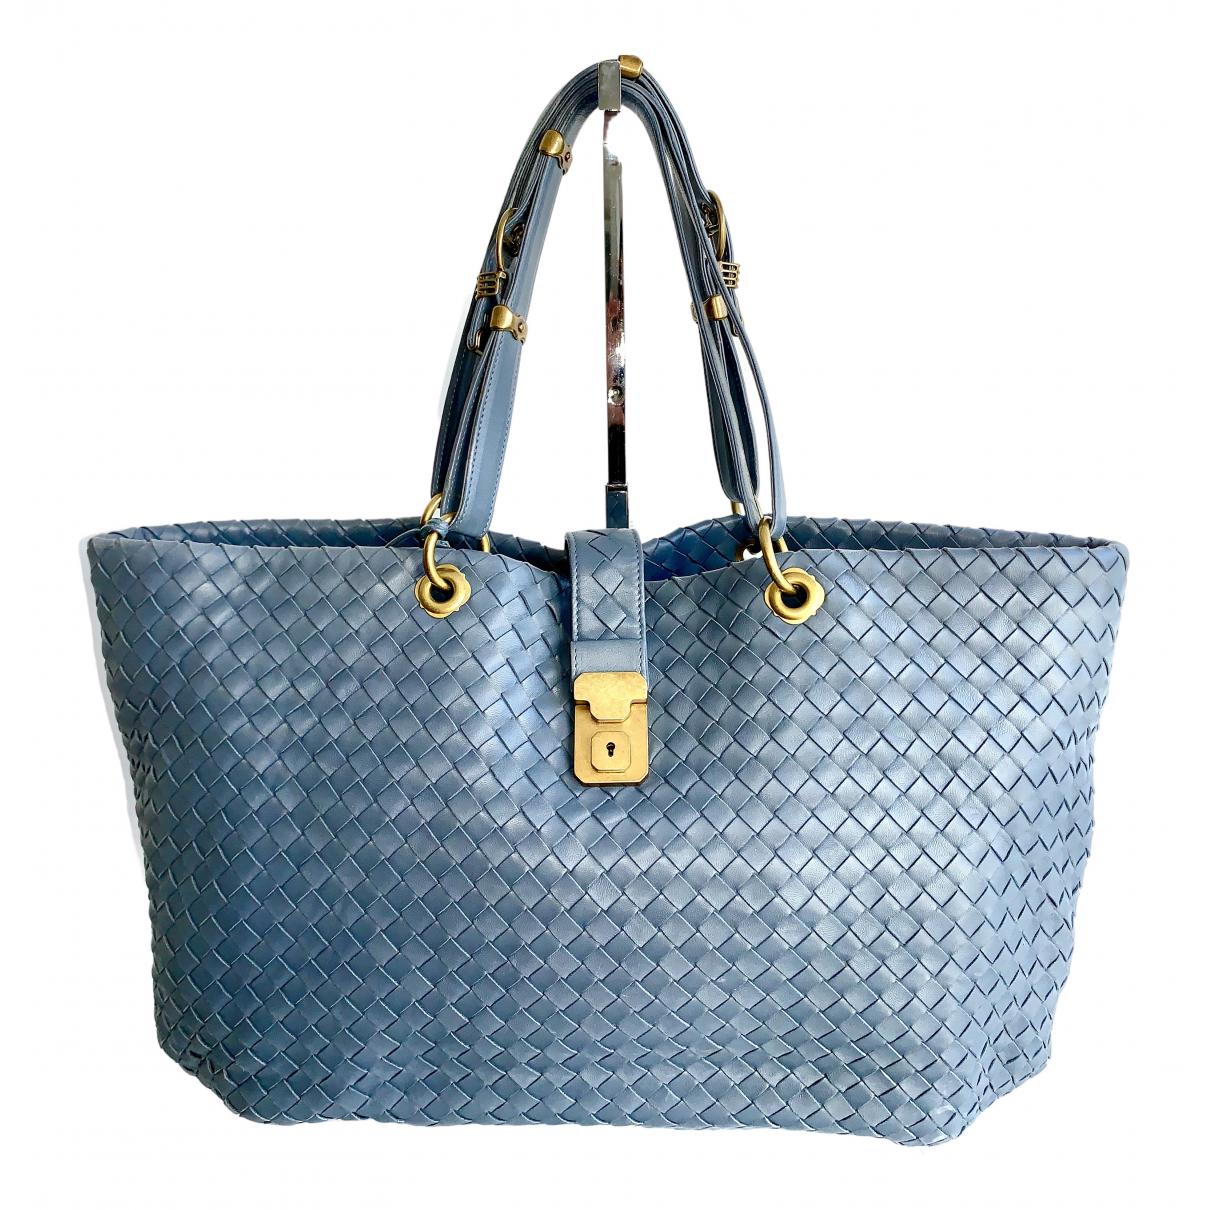 Bottega Veneta Fourre-Tout  Blue Leather handbag for Women N